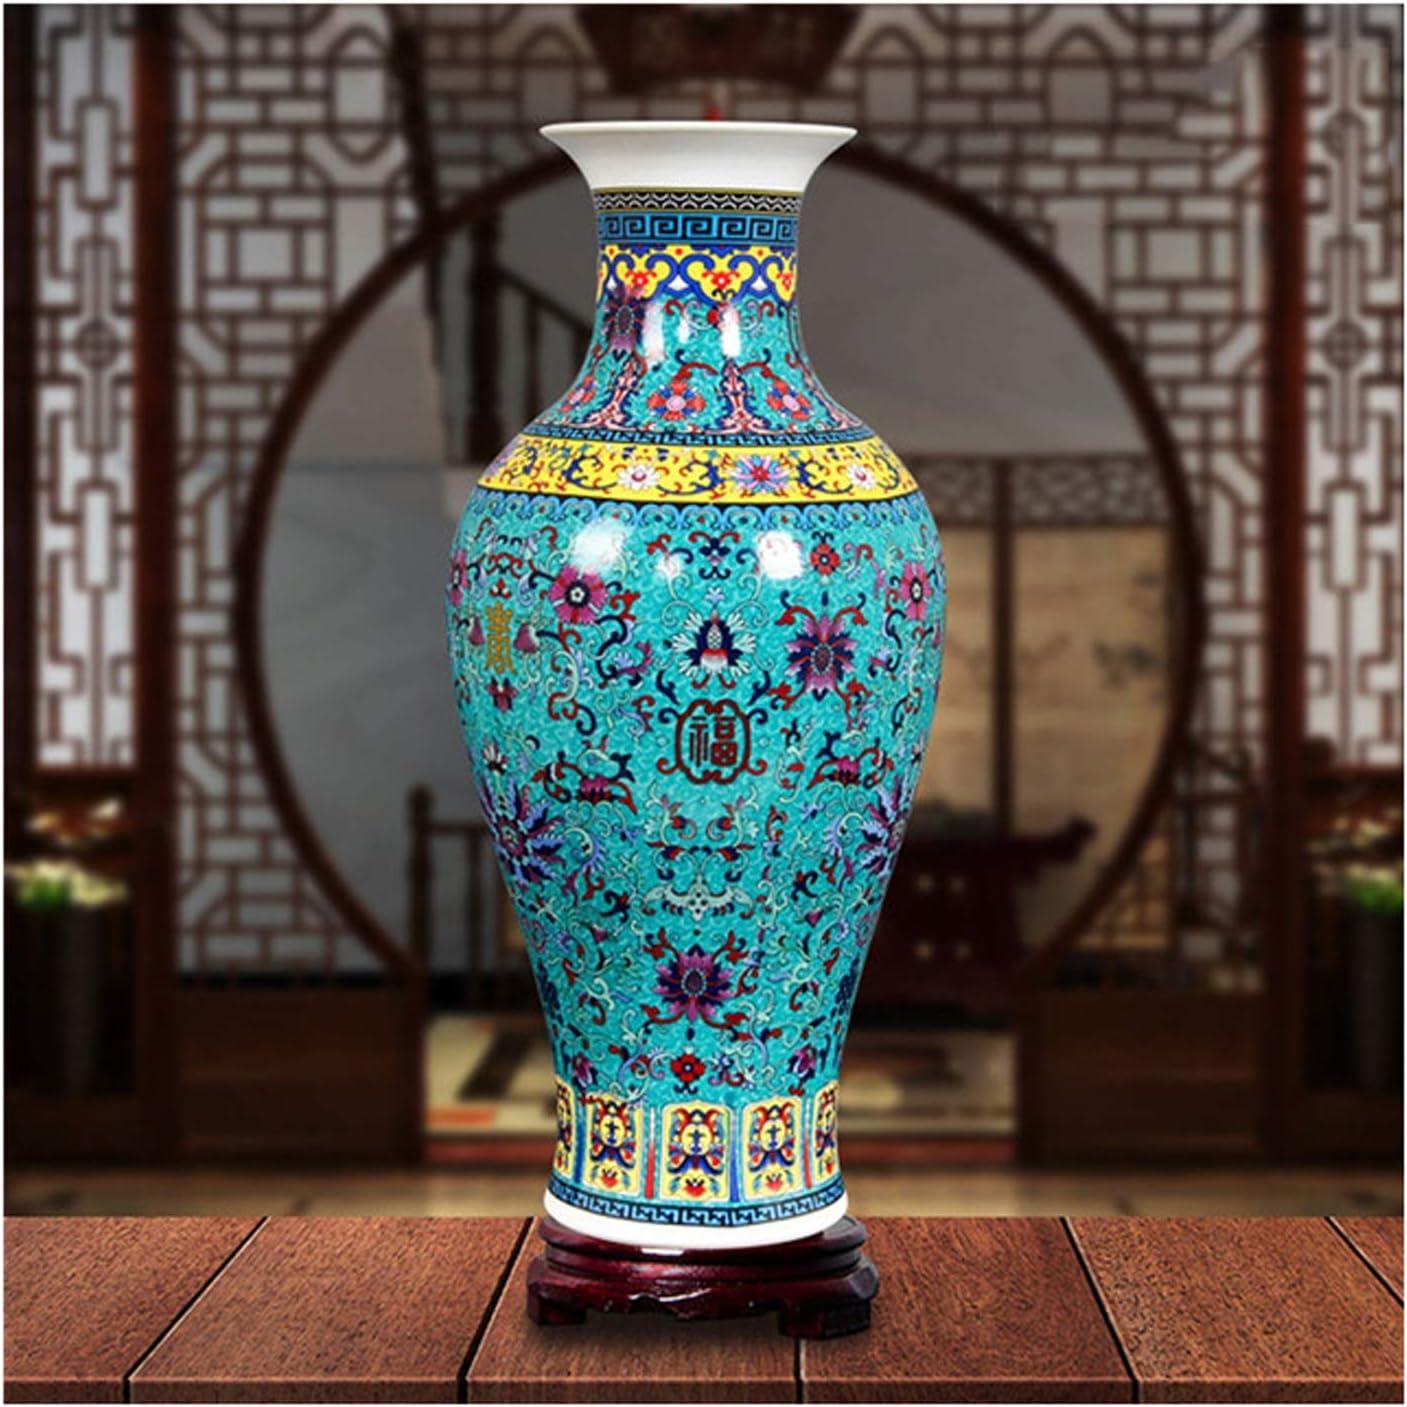 All stores are sold jinyi2016SHOP Flower Vase Jingdezhen Antique Enamel Floor Big Limited time trial price Va